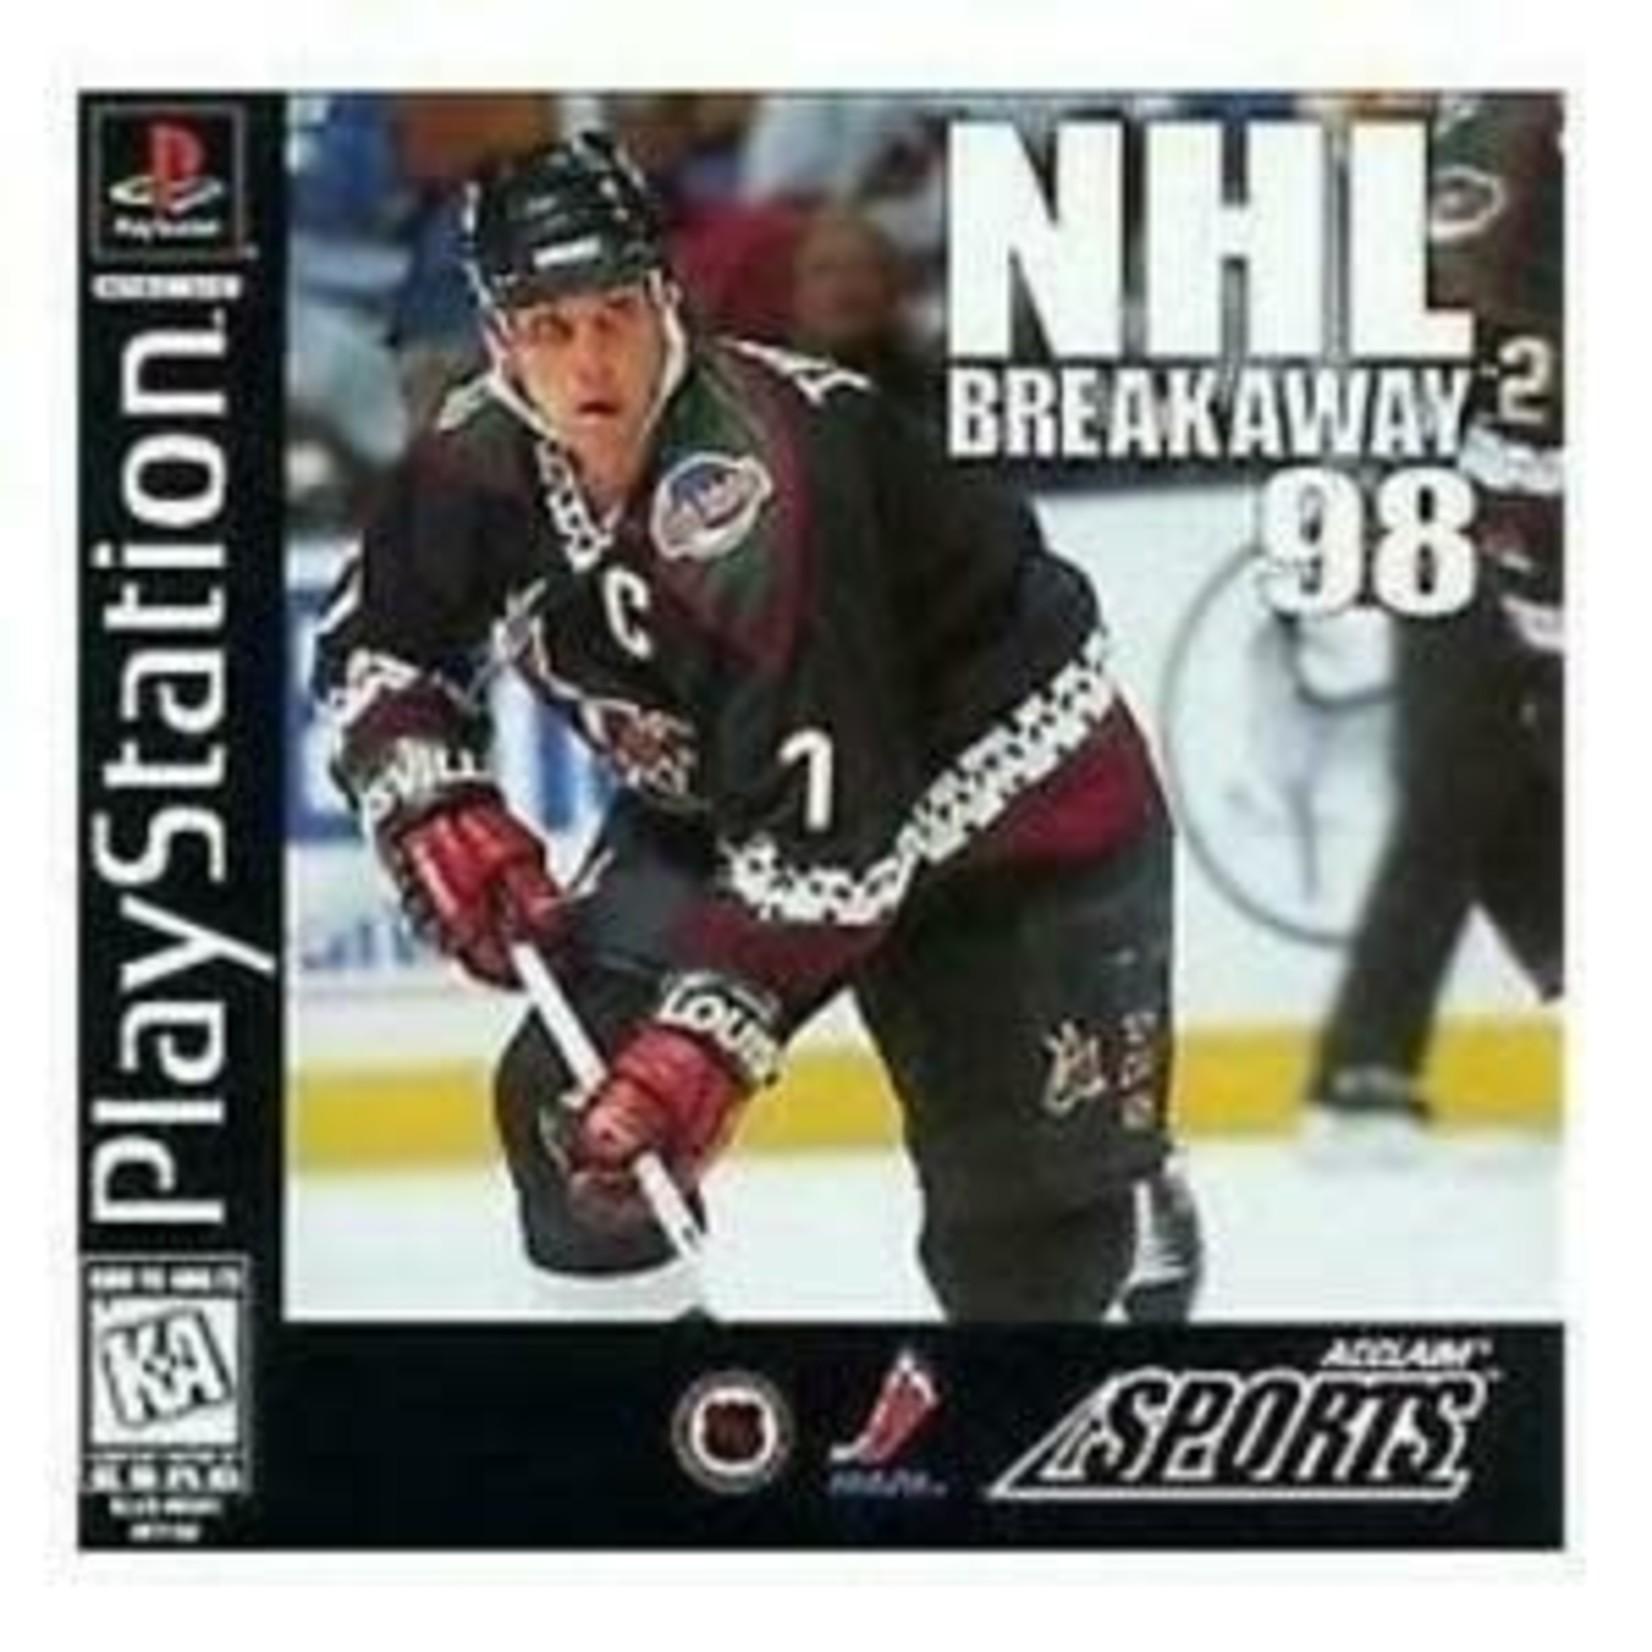 ps1u-NHL Breakaway 98